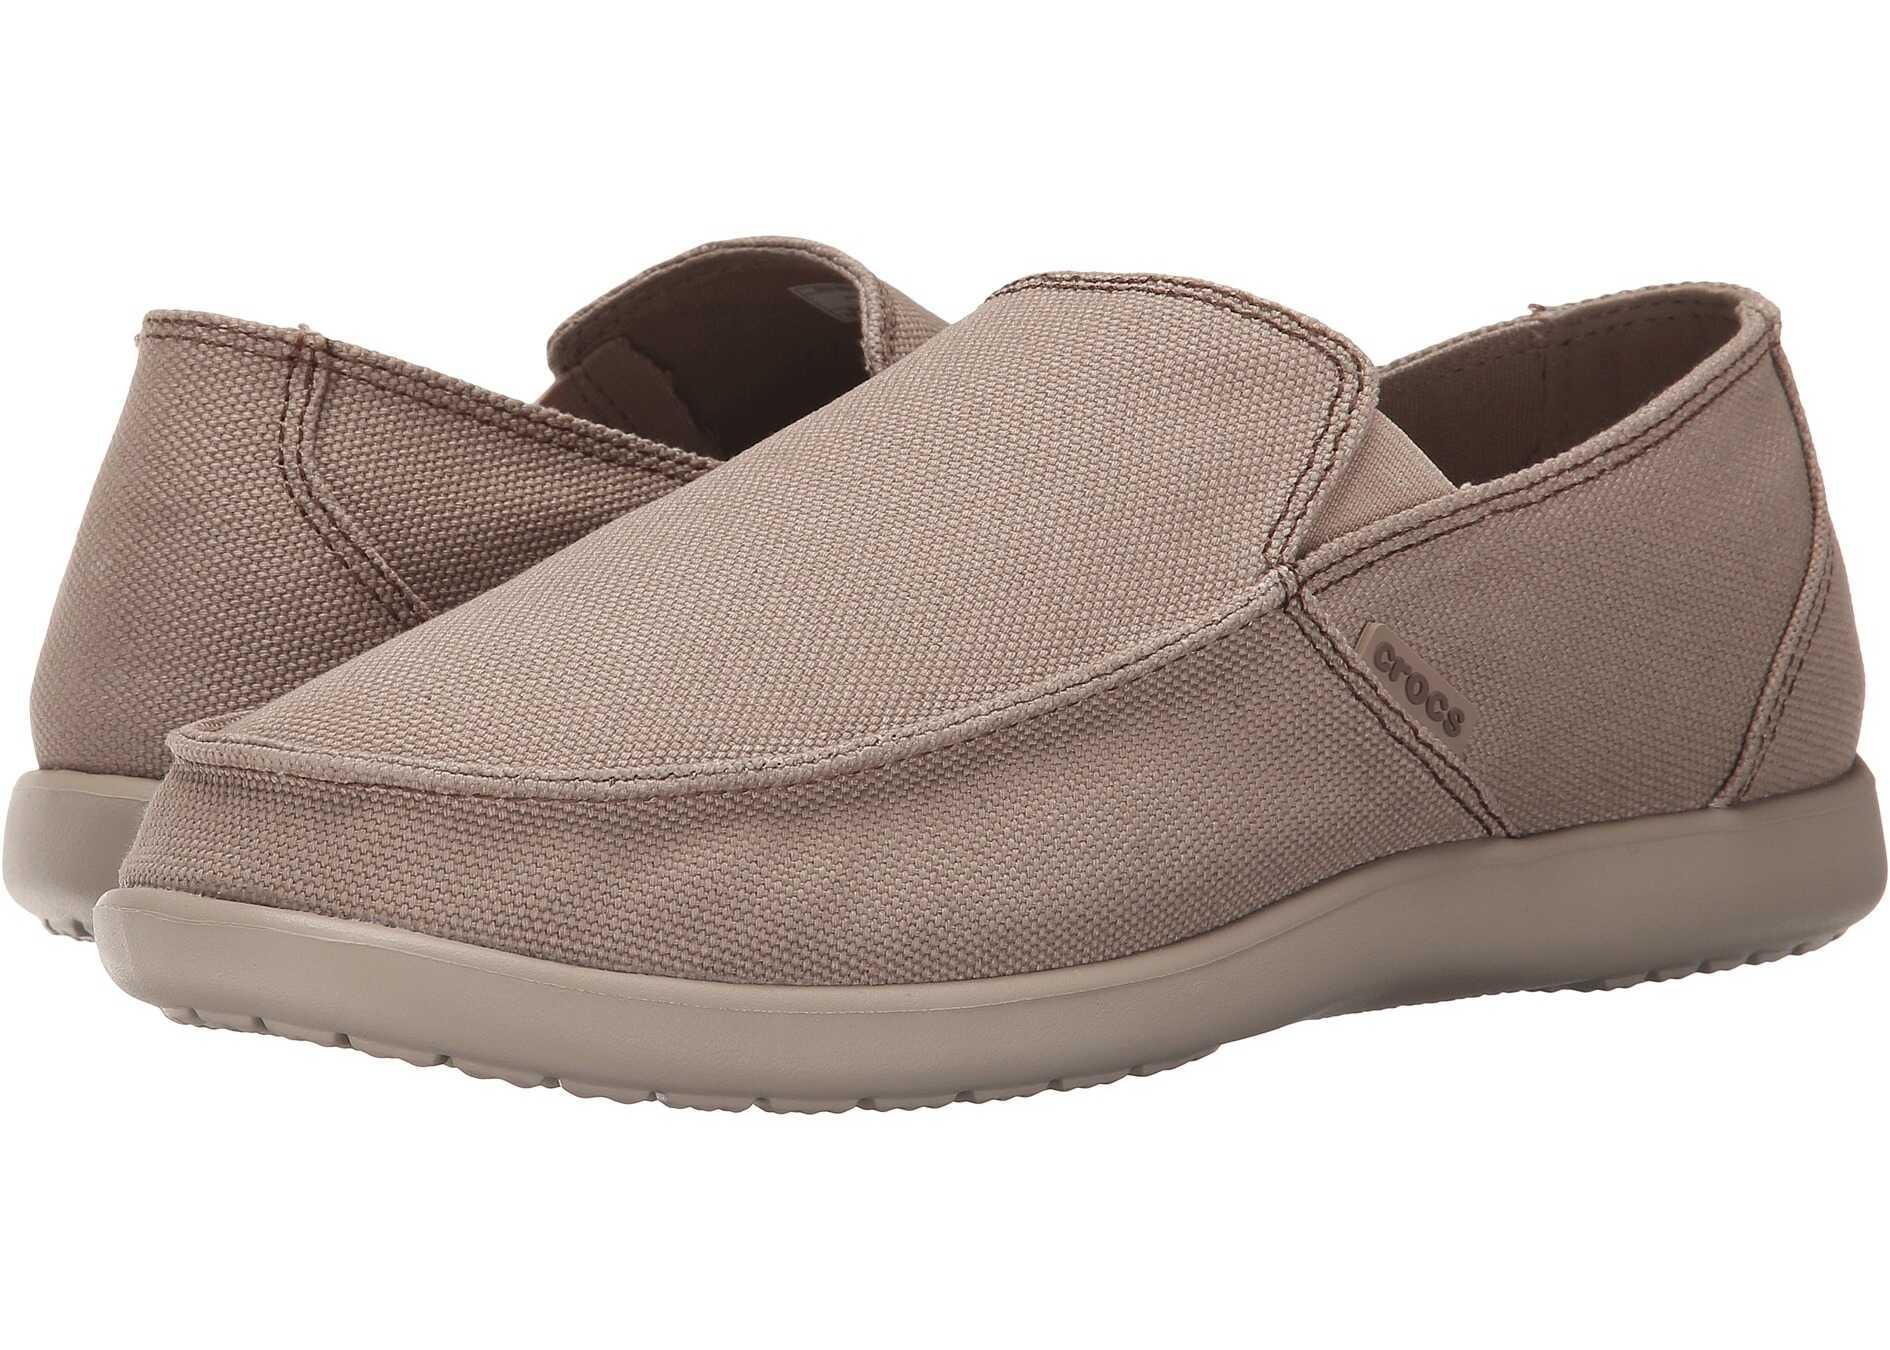 Crocs Santa Cruz Clean Cut Loafer Khaki/Cobblestone